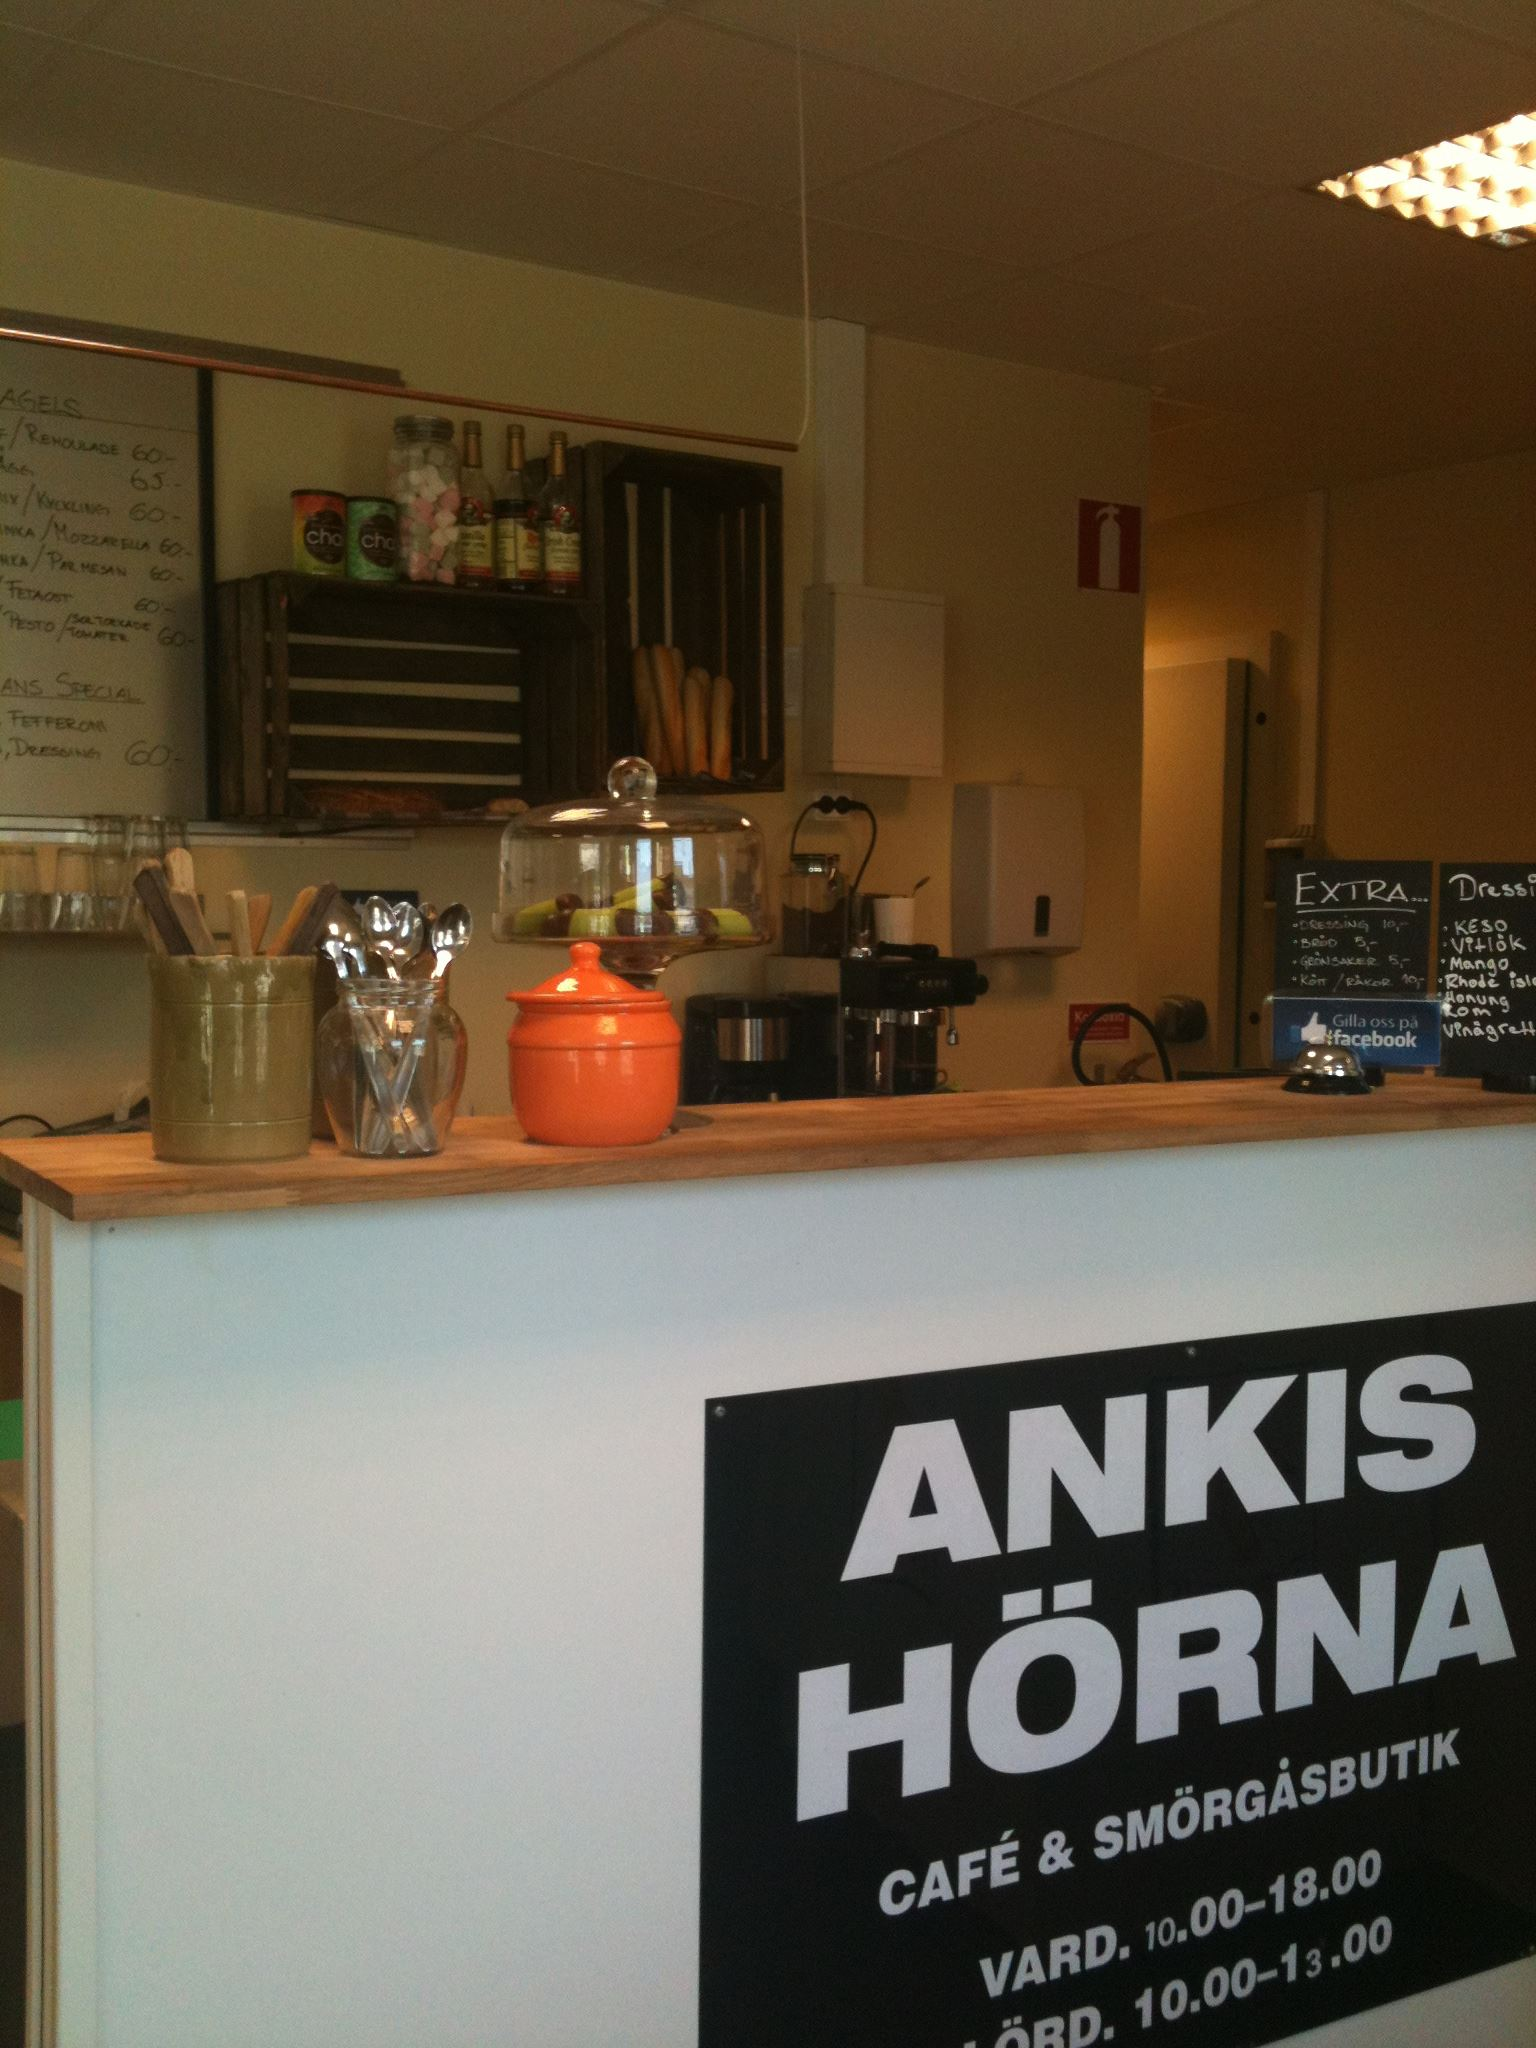 Turistbyrån, Ankis Hörna